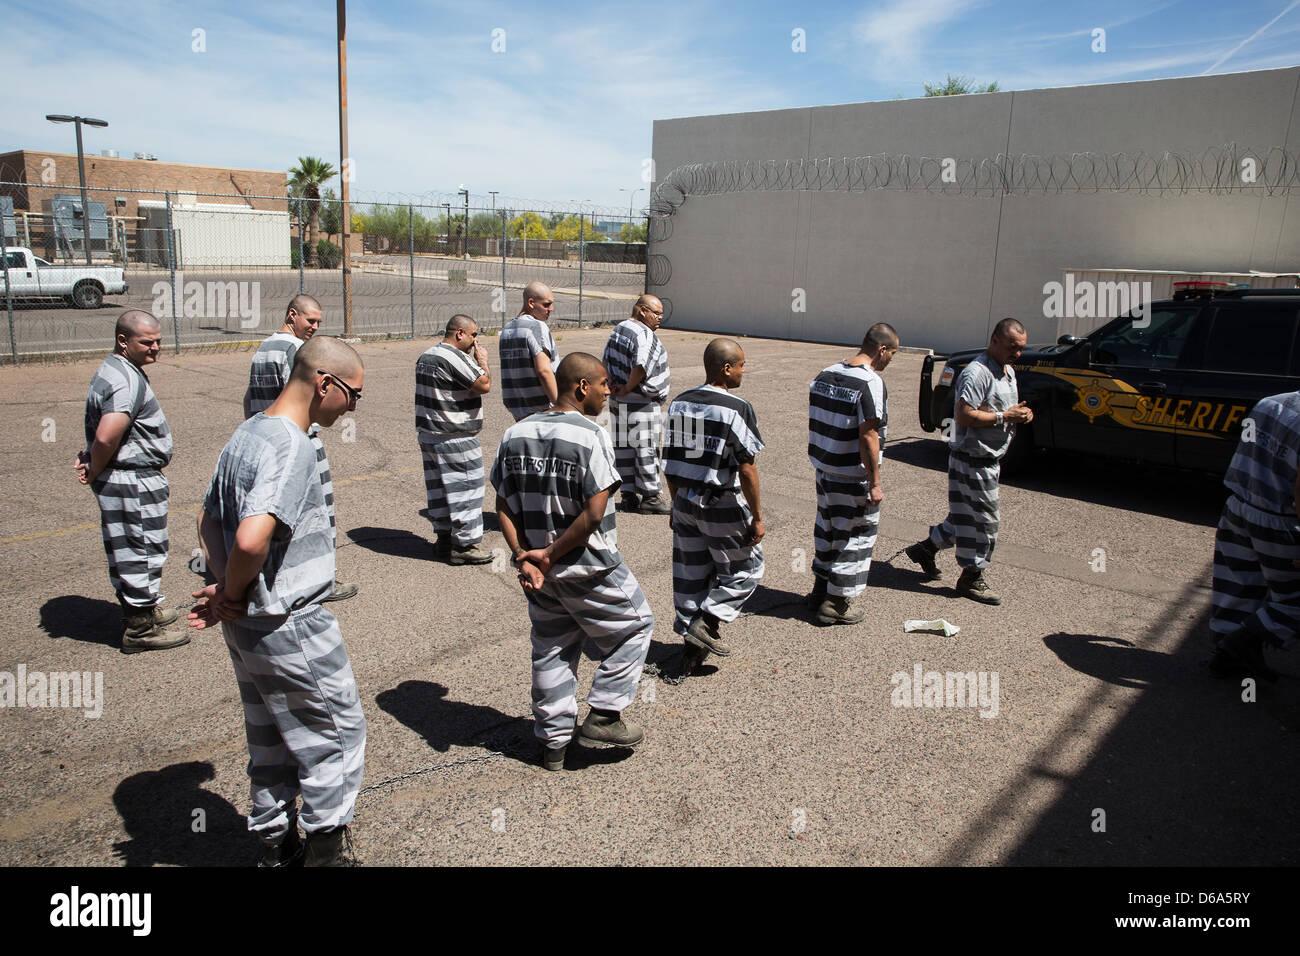 Maricopa County-Estrella Jail - Inmate Search | Visits ...